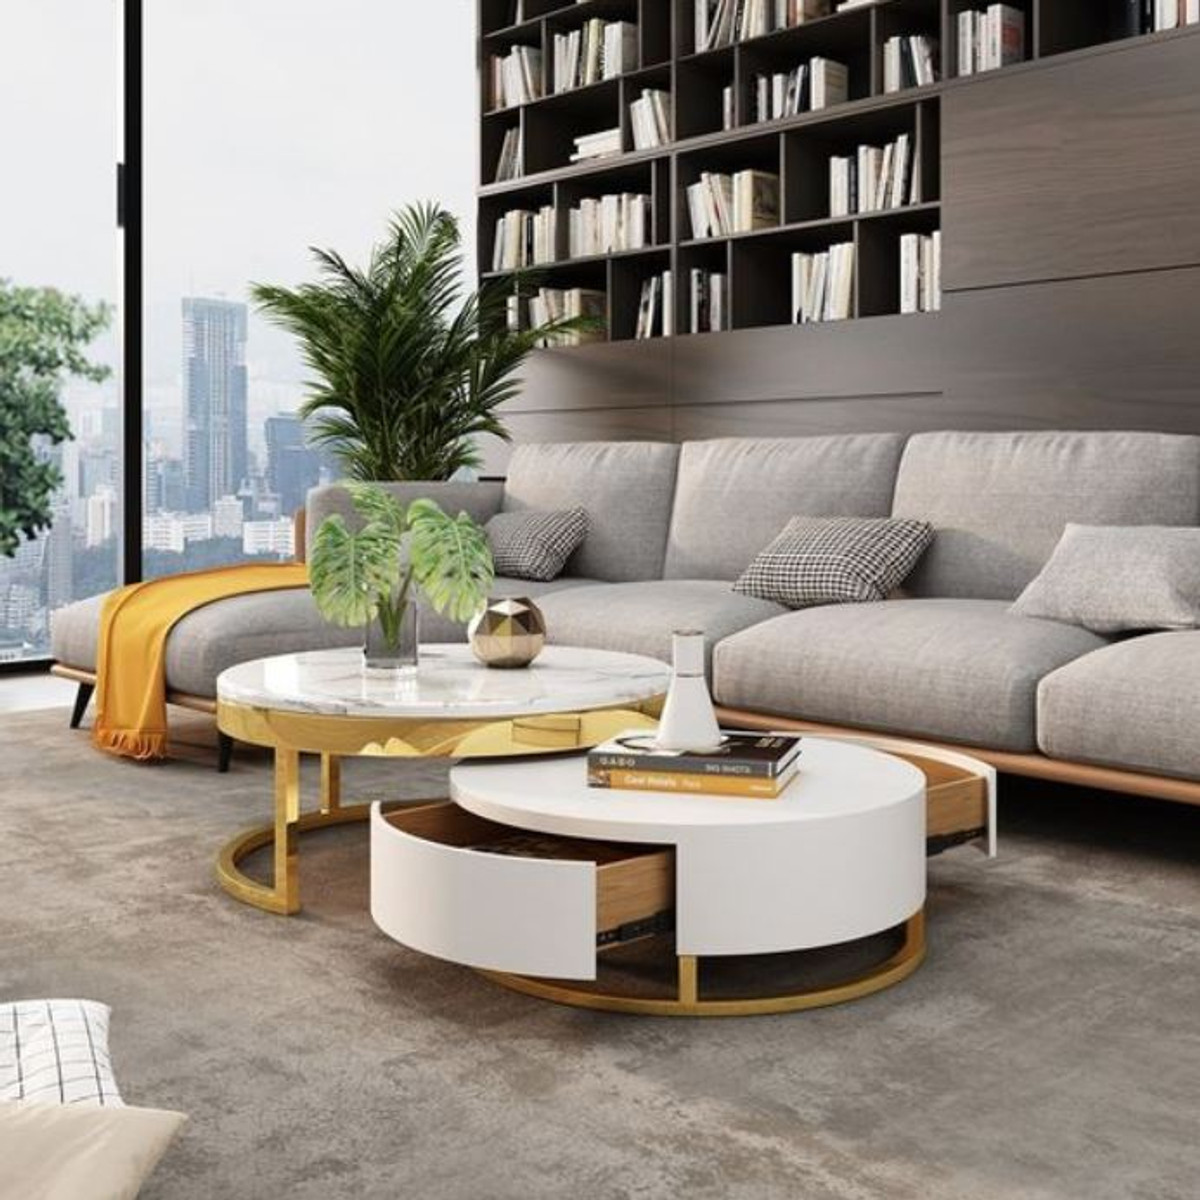 casa padrino ensemble de table basse de luxe blanc or 2 tables de salon rondes meubles de salon qualite de luxe